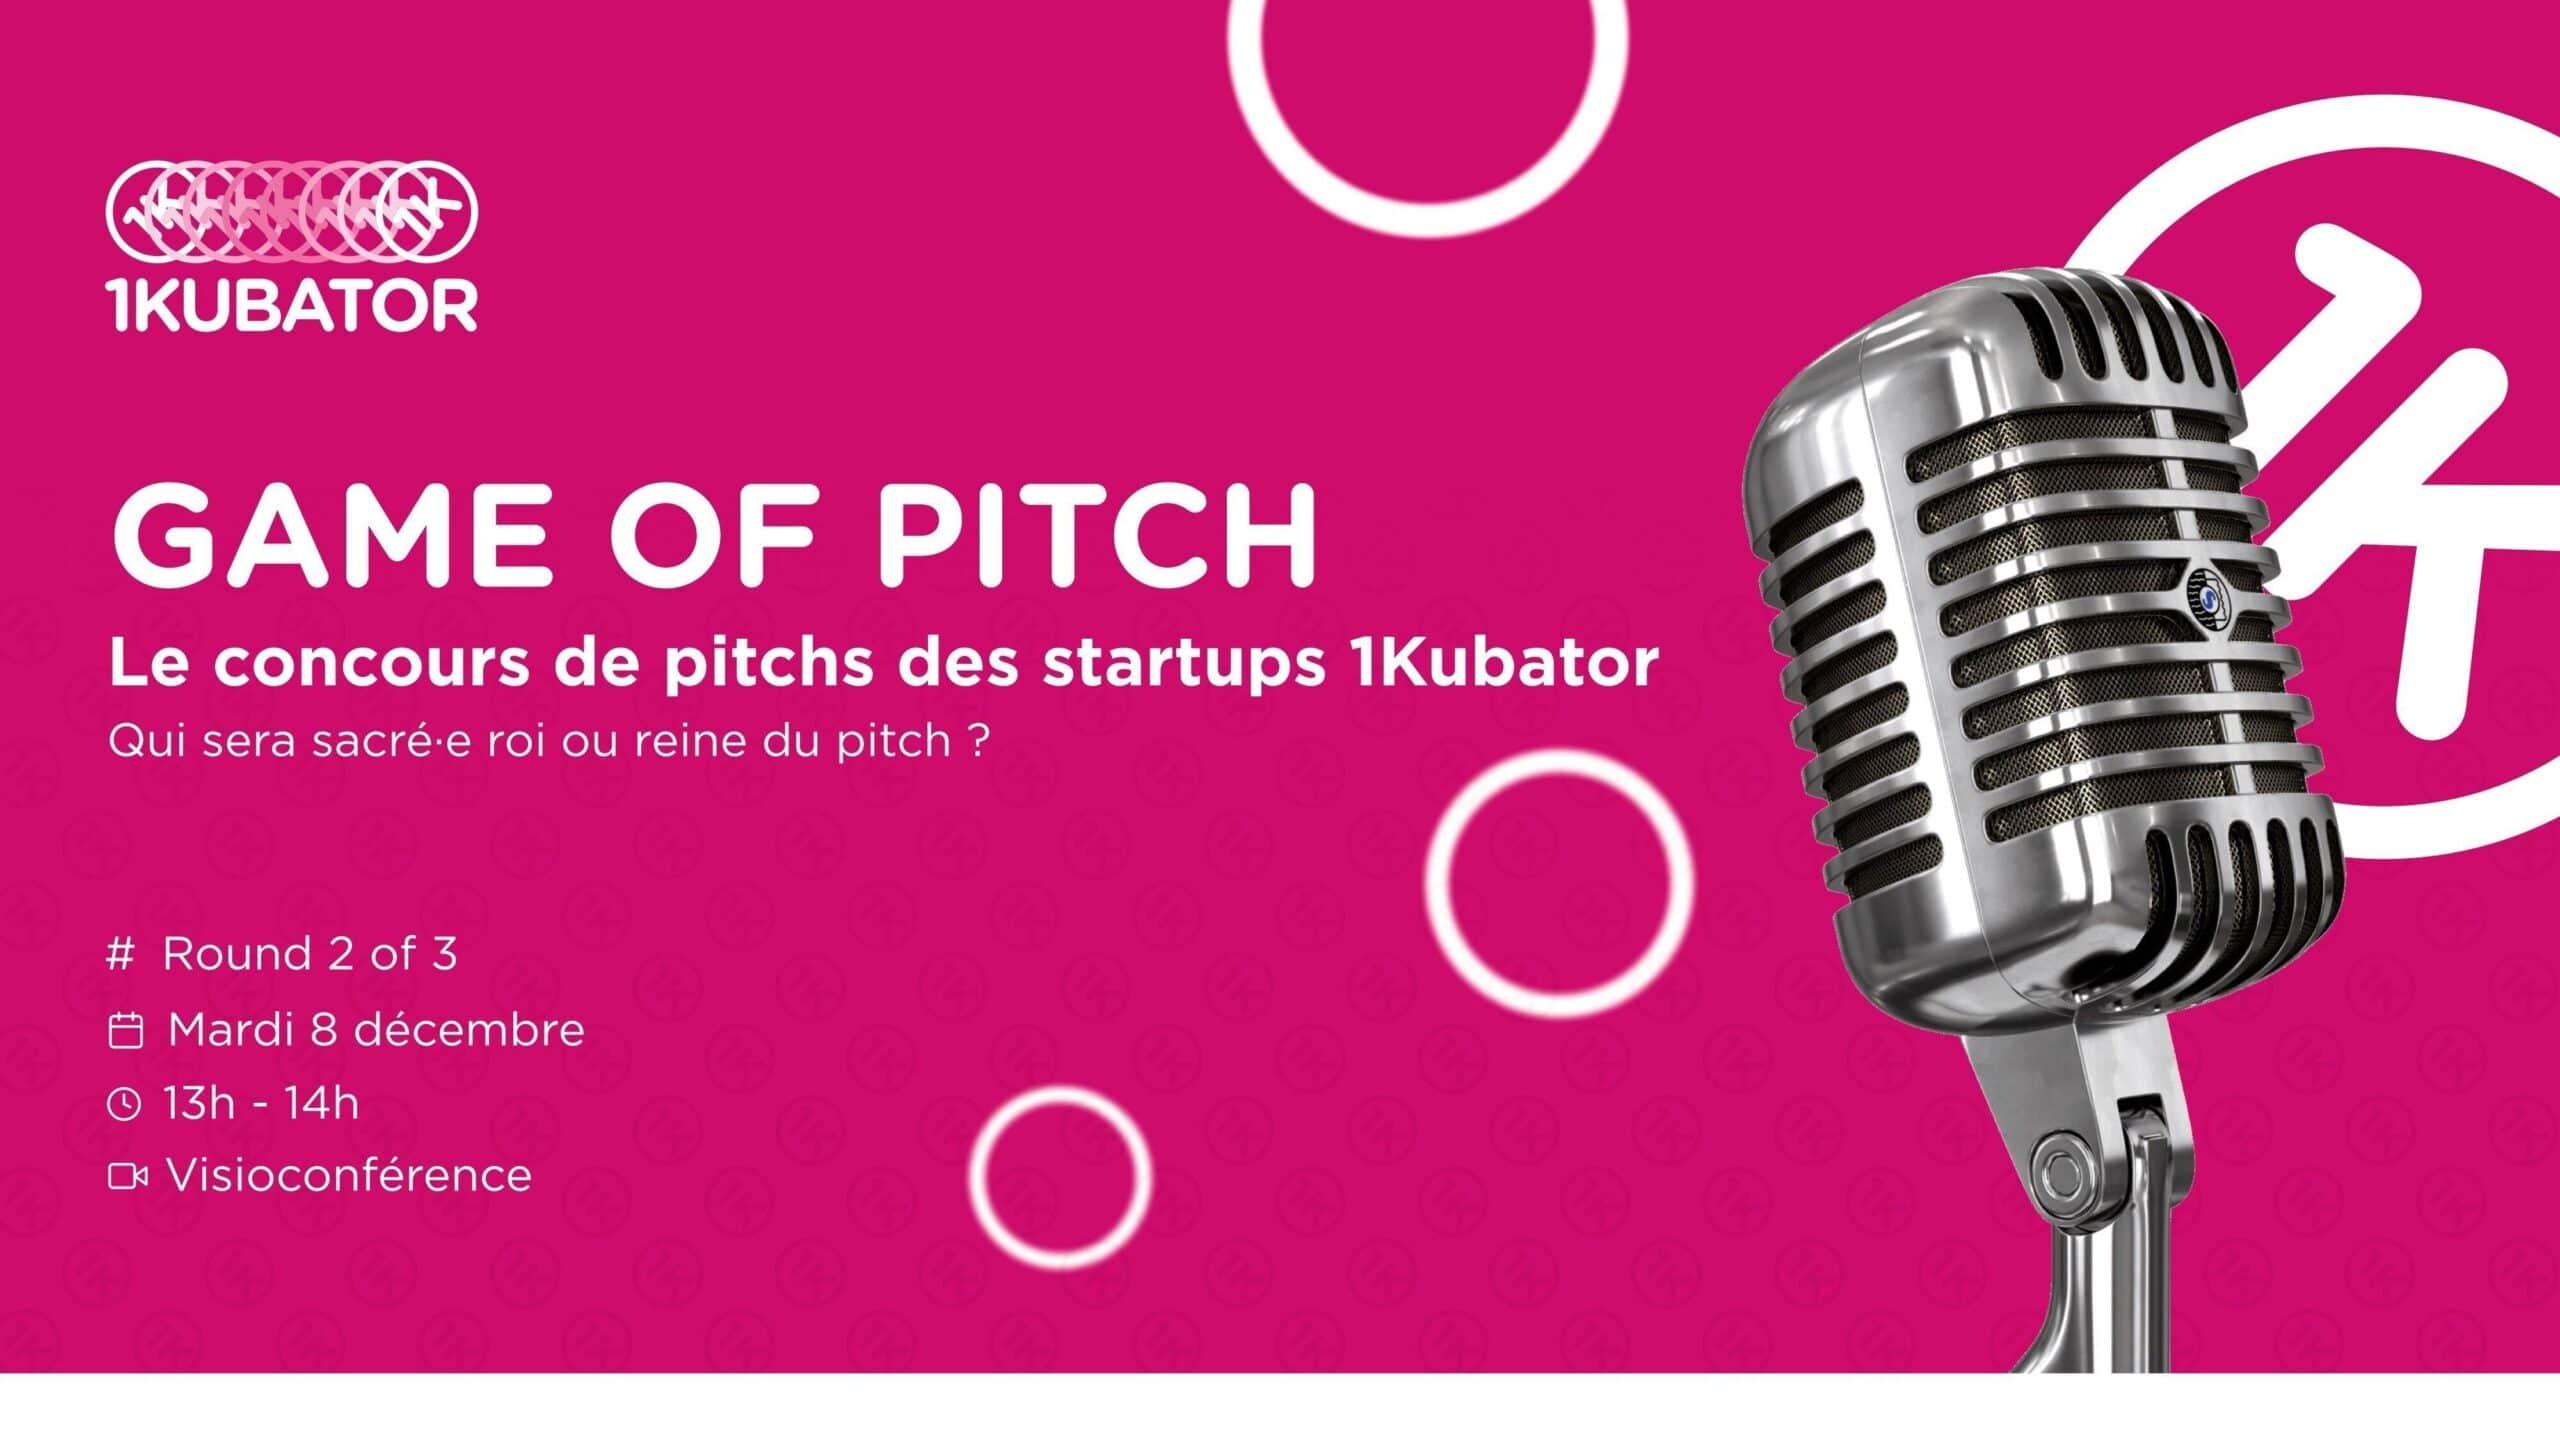 game of pitch_1kubator